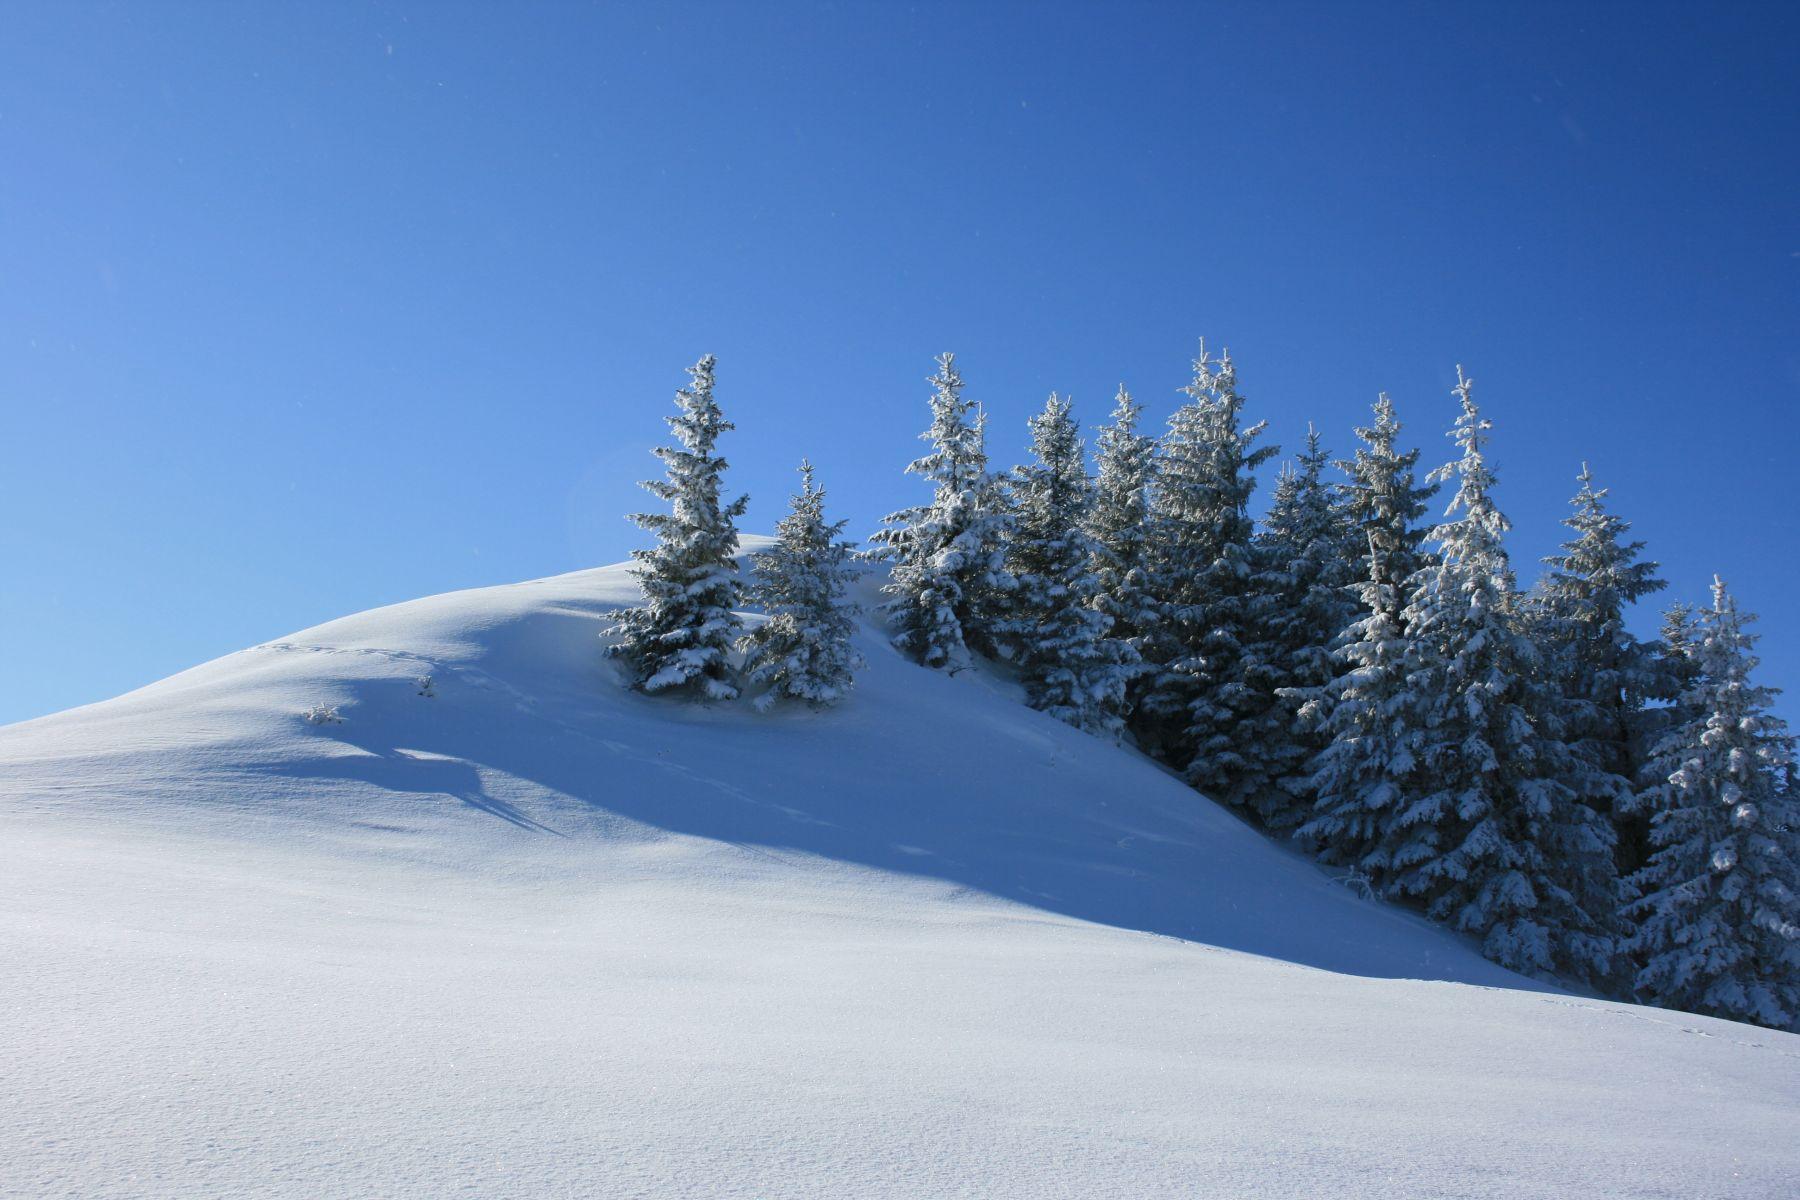 Sfondo paesaggio neve in montagna sfondi hd gratis for Sfondi desktop hd paesaggi